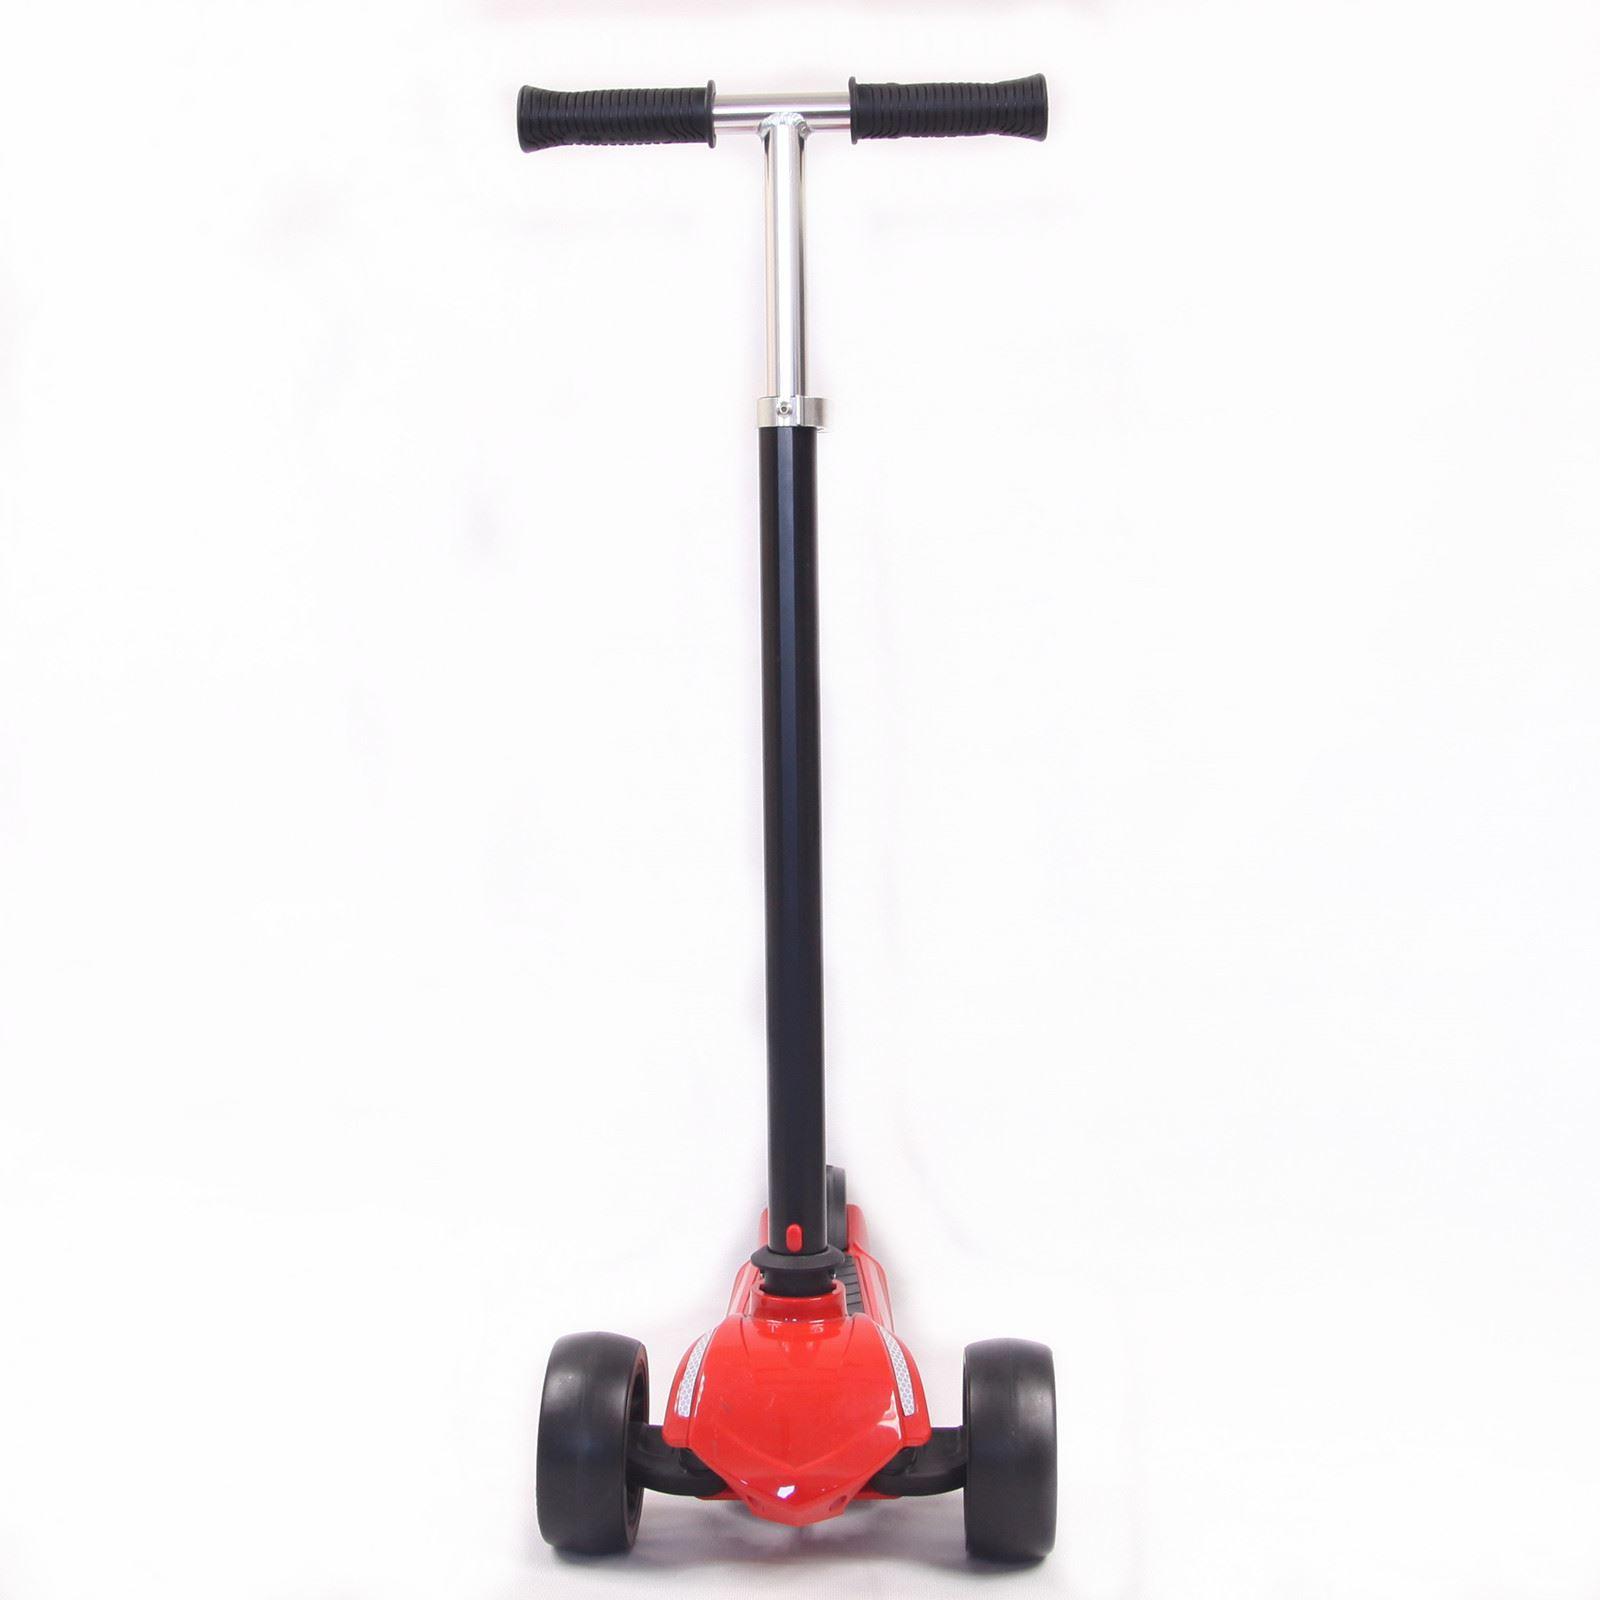 3 rad scooter f r erwachsene und kinder kick push stunt. Black Bedroom Furniture Sets. Home Design Ideas